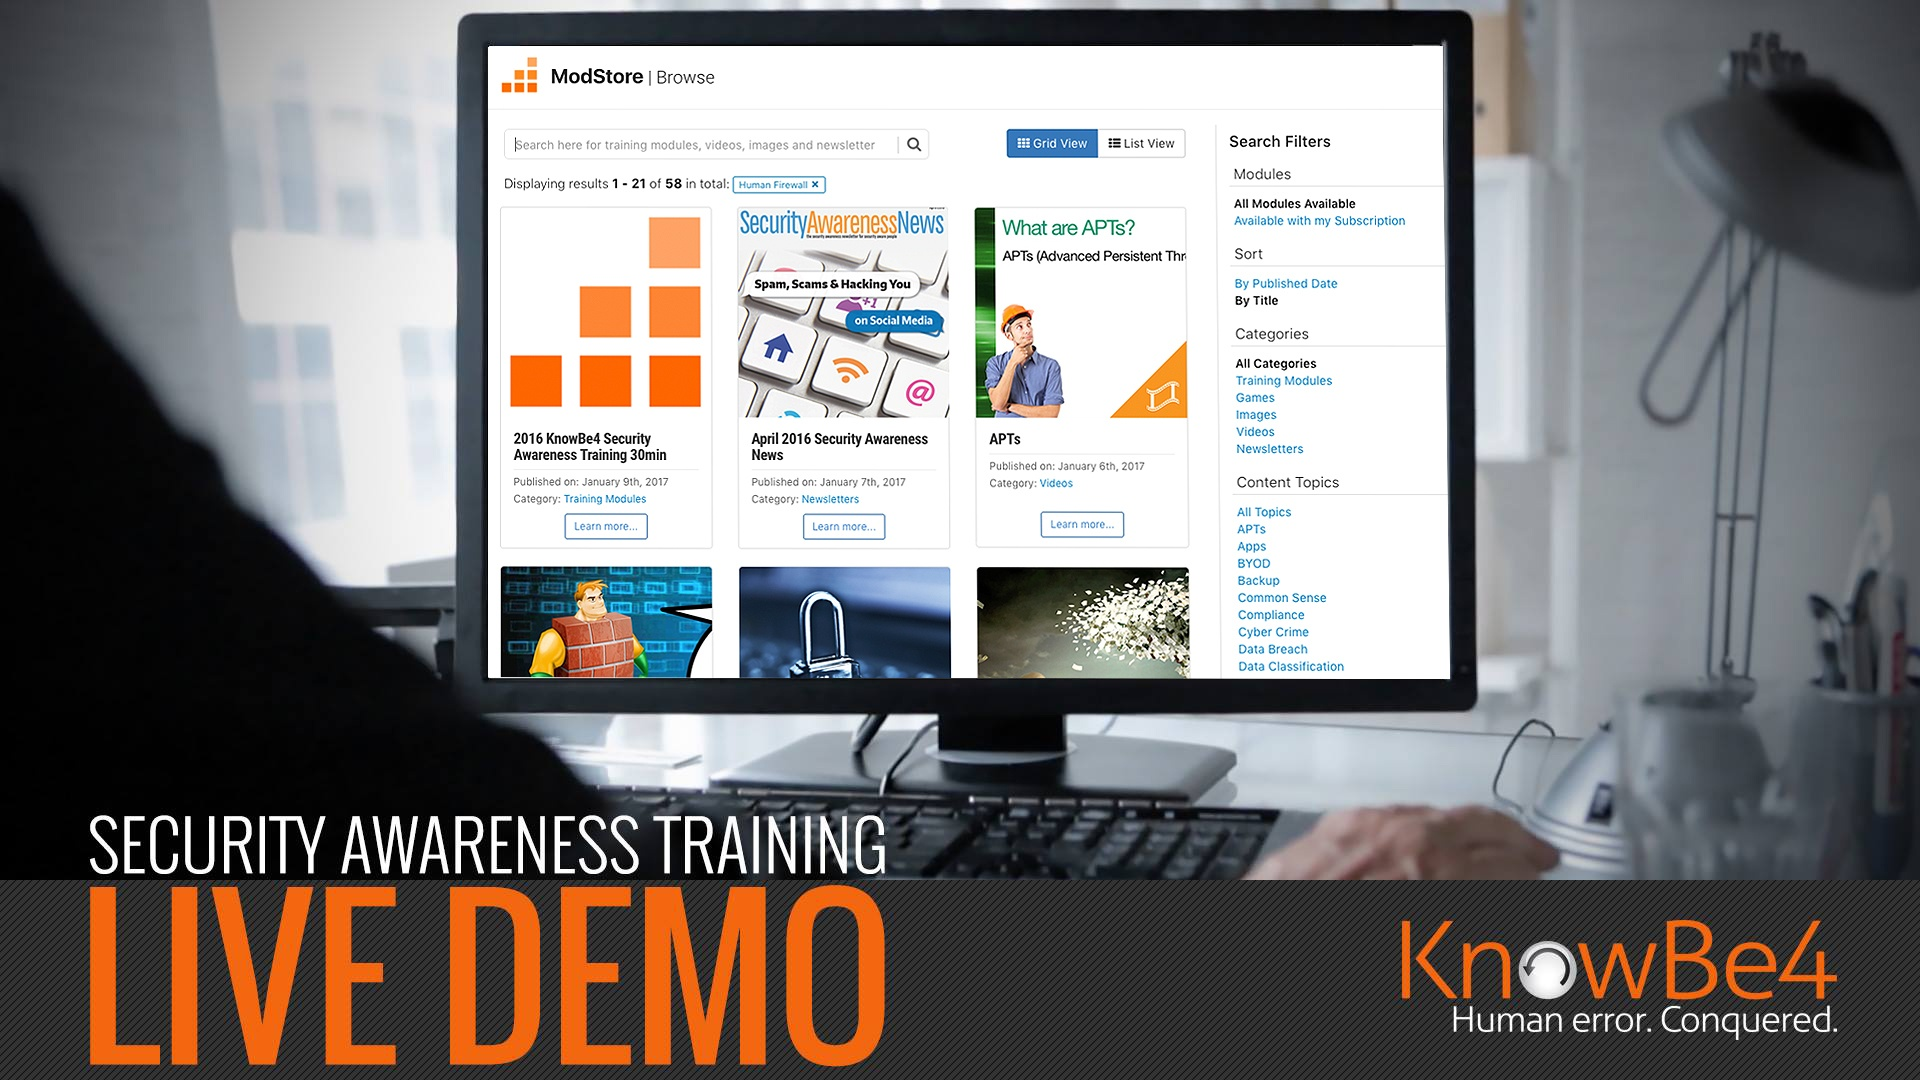 security-awareness-training-live-demo